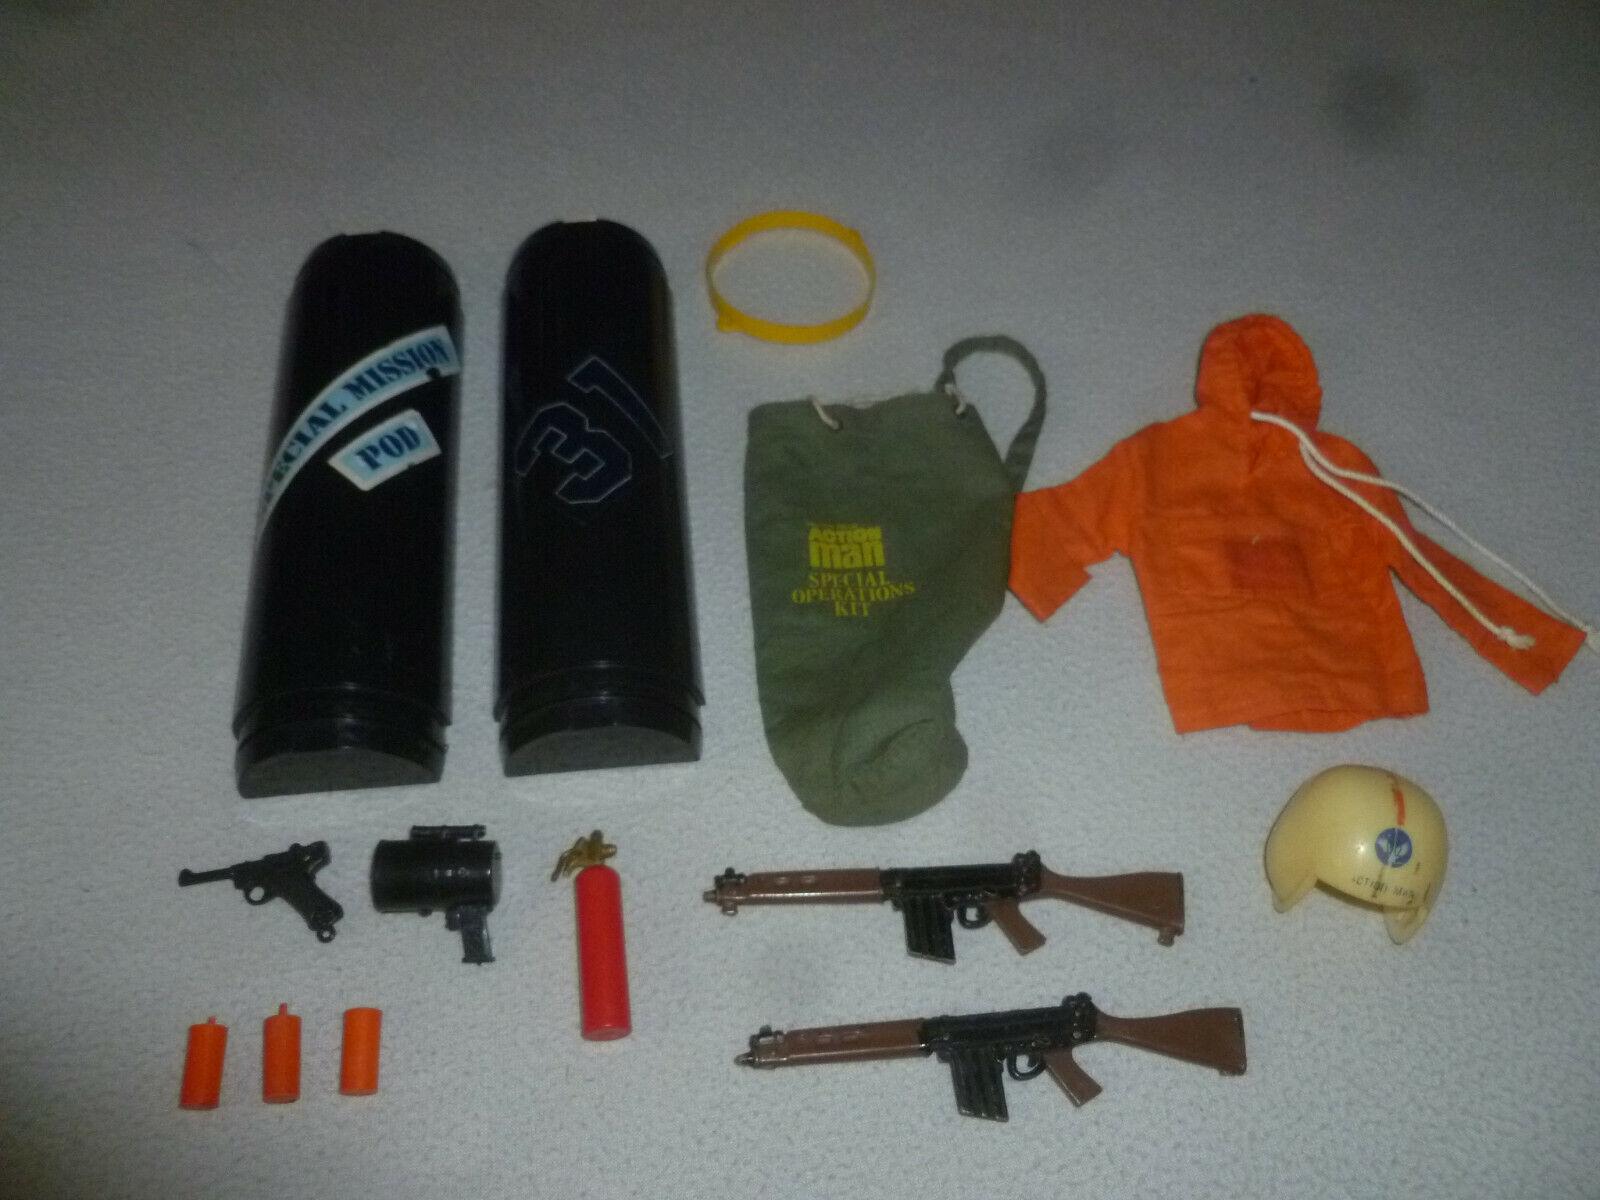 Jahrgang GI JOE PALISpielzeug Wirkung MAN besondere MISSION POD 1970S HELMET GUN COAT BAG